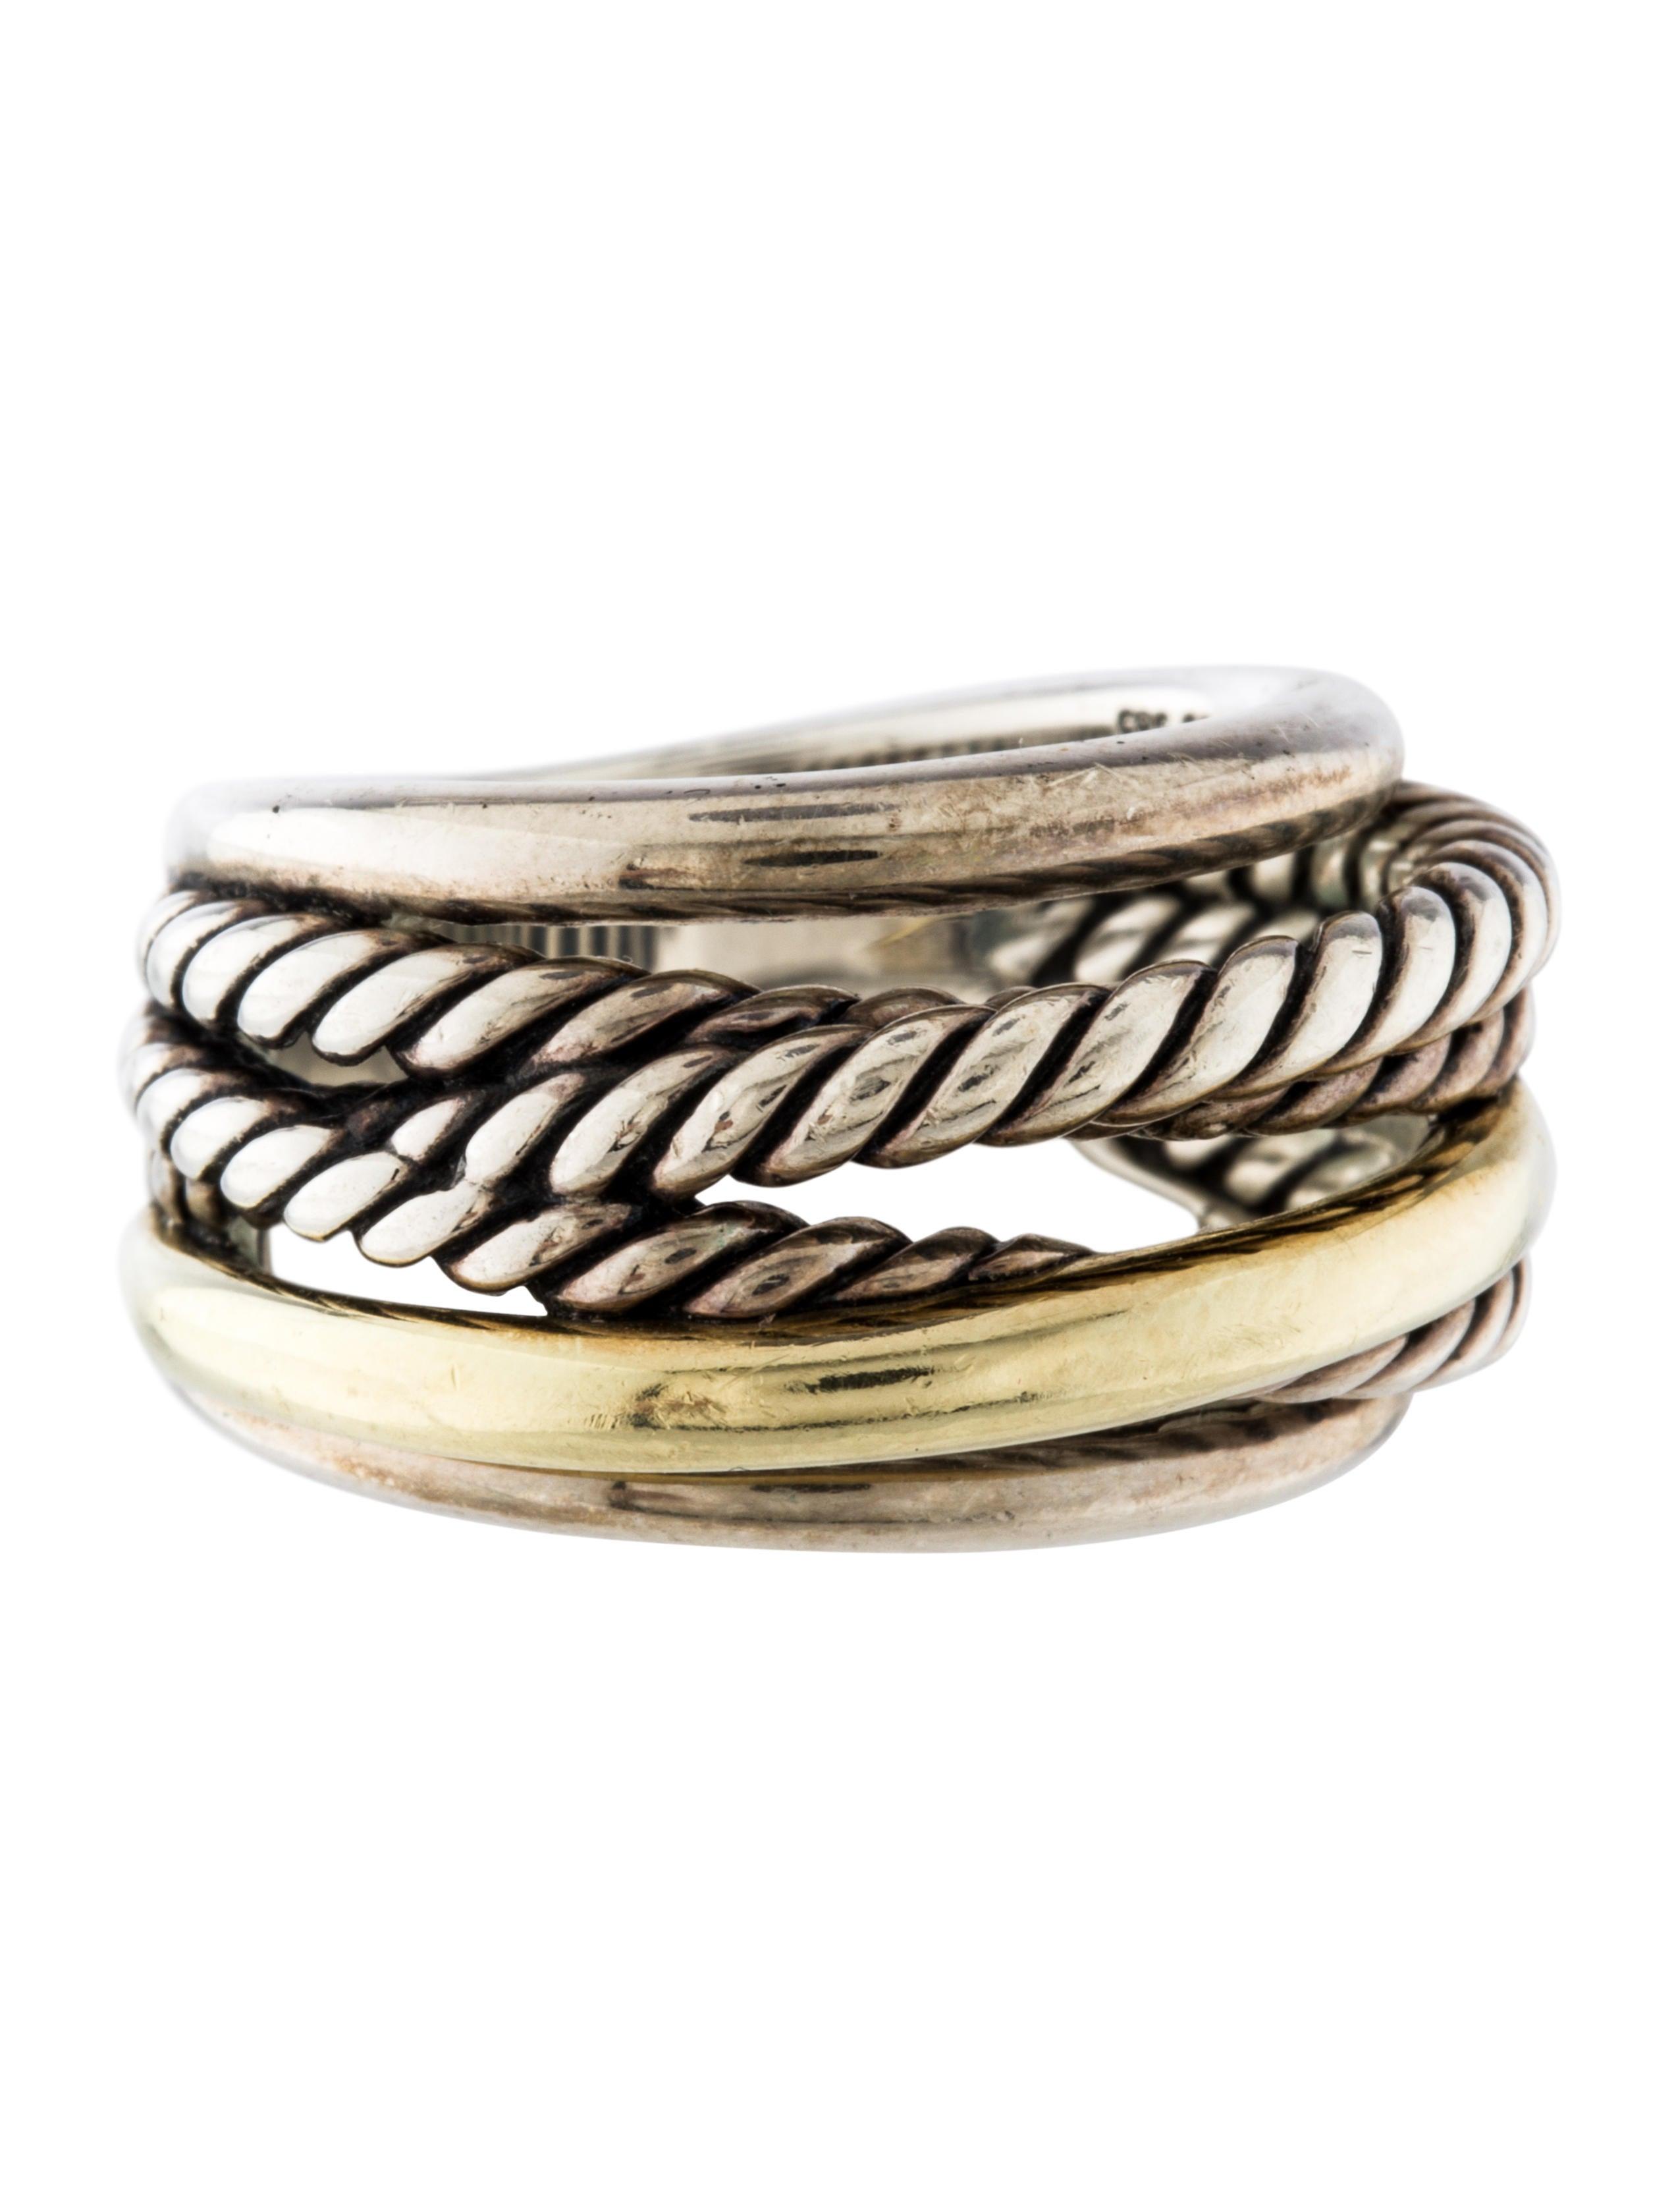 David yurman crossover ring rings dvy36898 the realreal for David yurman inspired jewelry rings